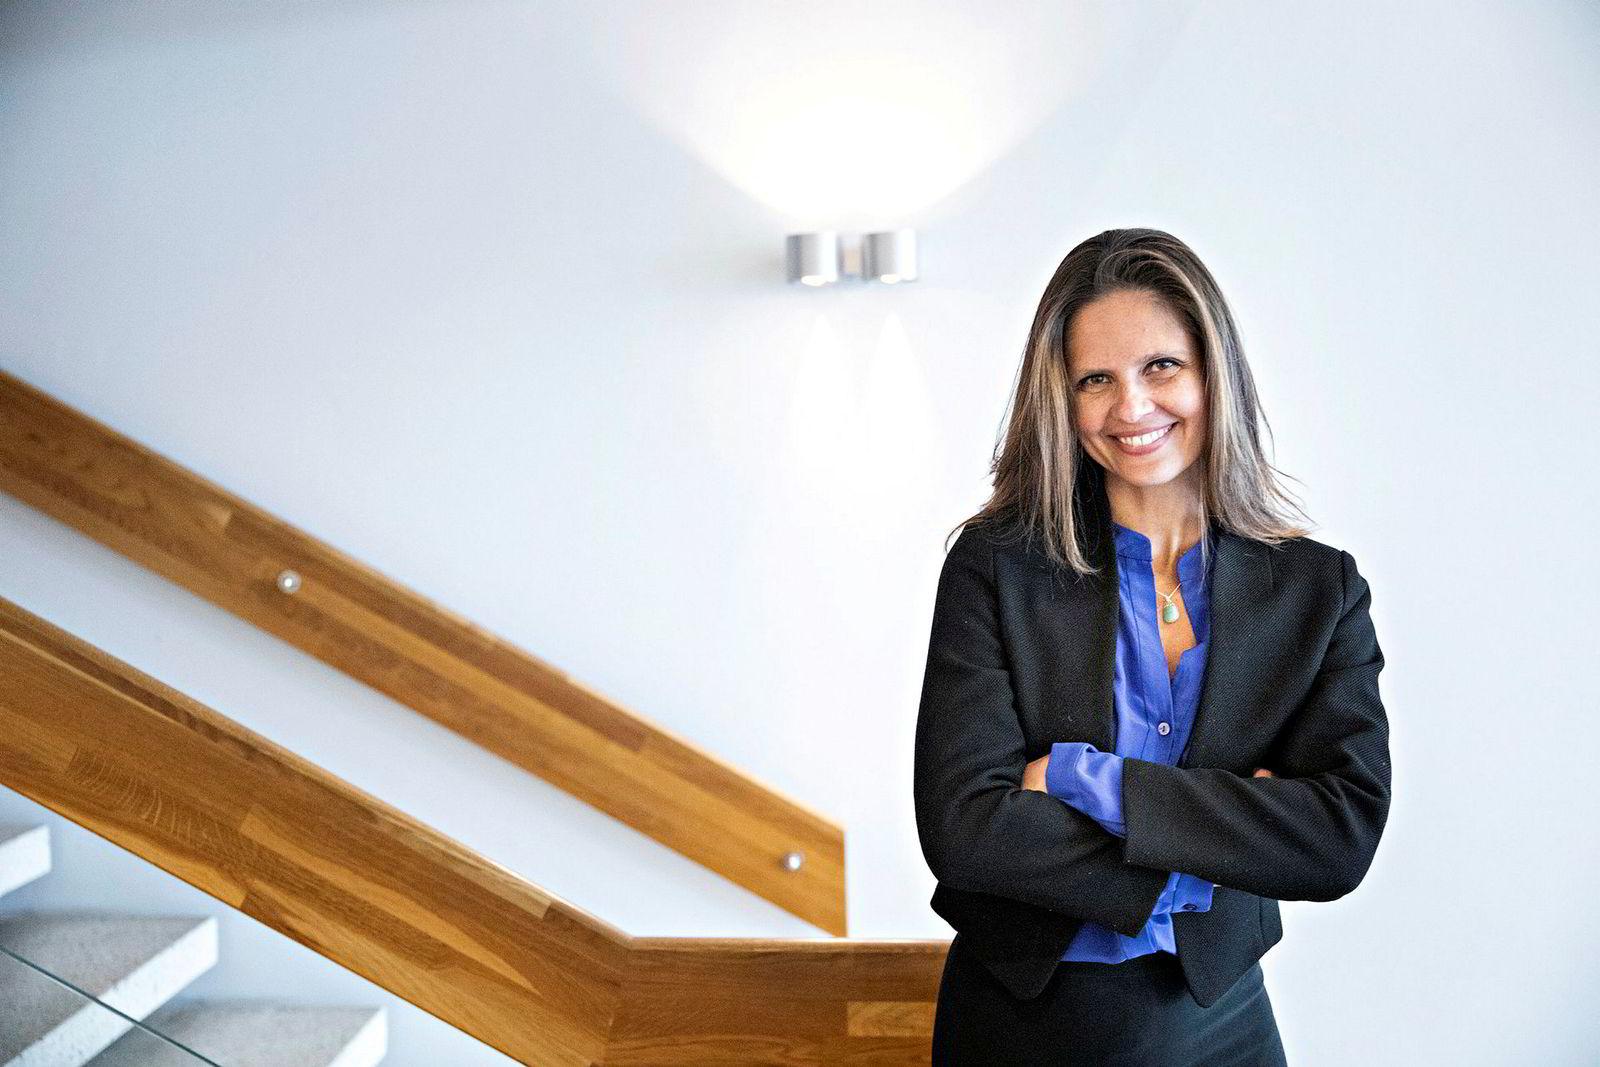 Oljeanalytiker Nadia Martin Wiggen i Pareto Securities.